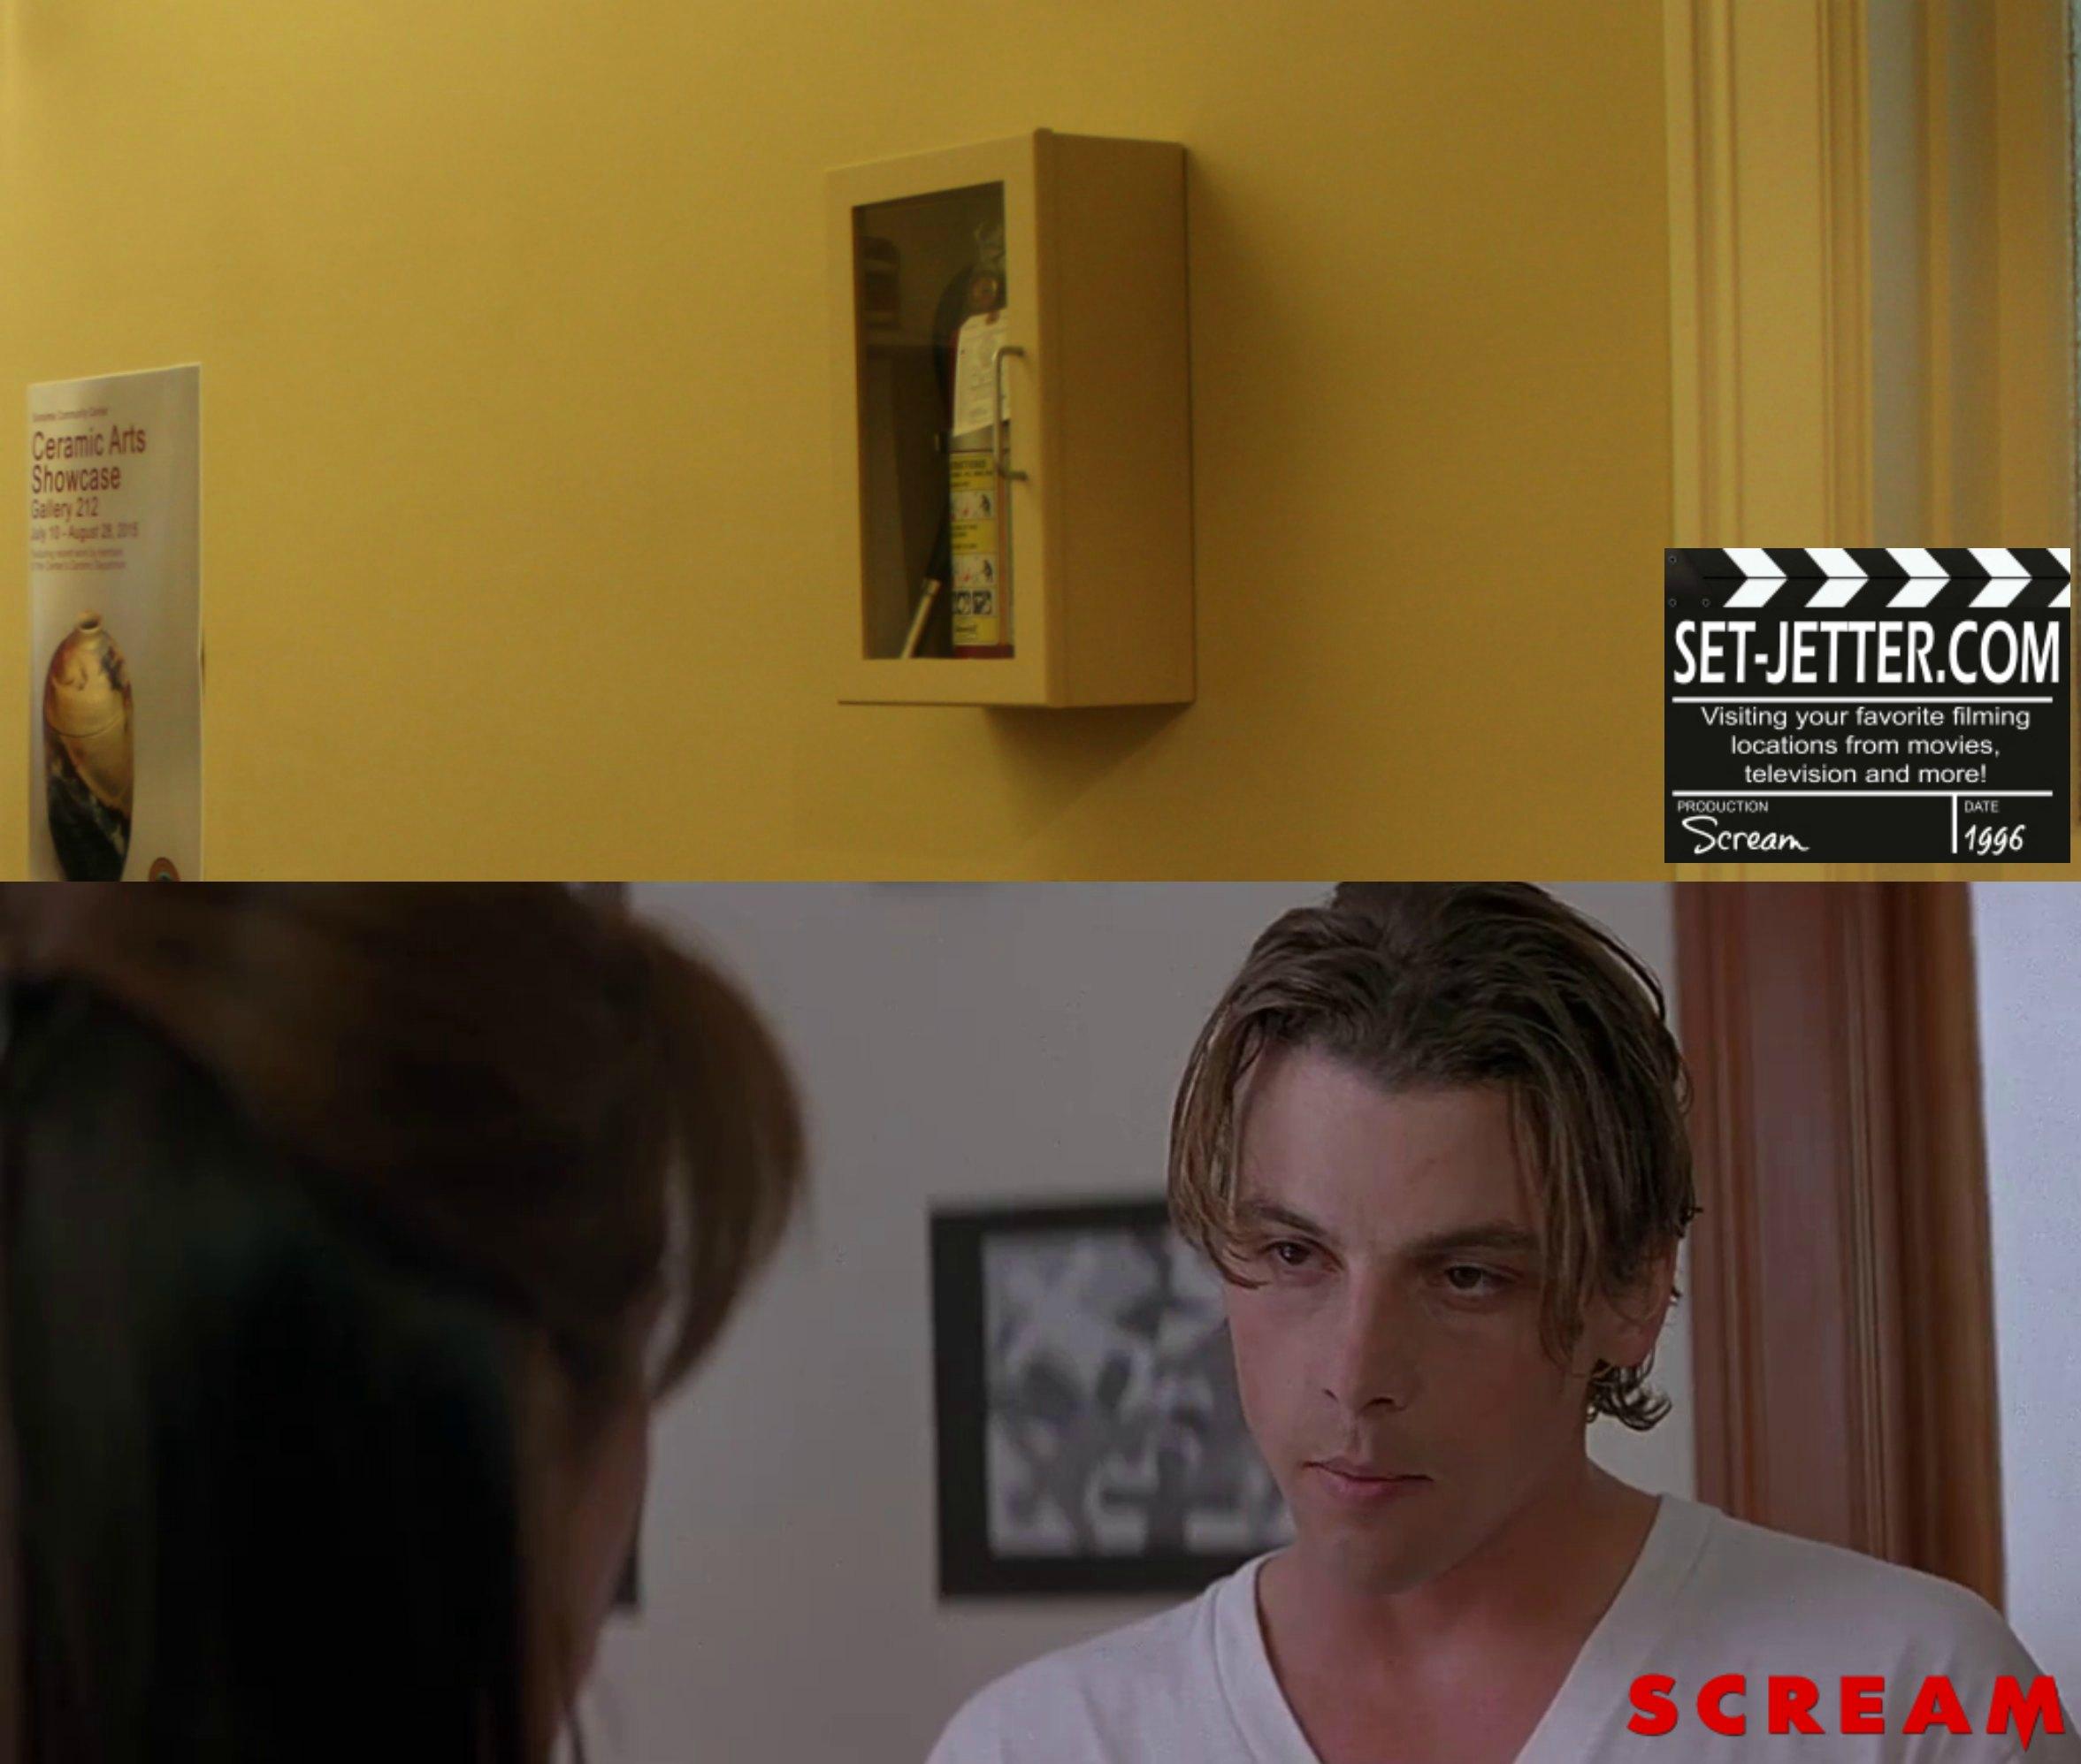 Scream comparison 96.jpg